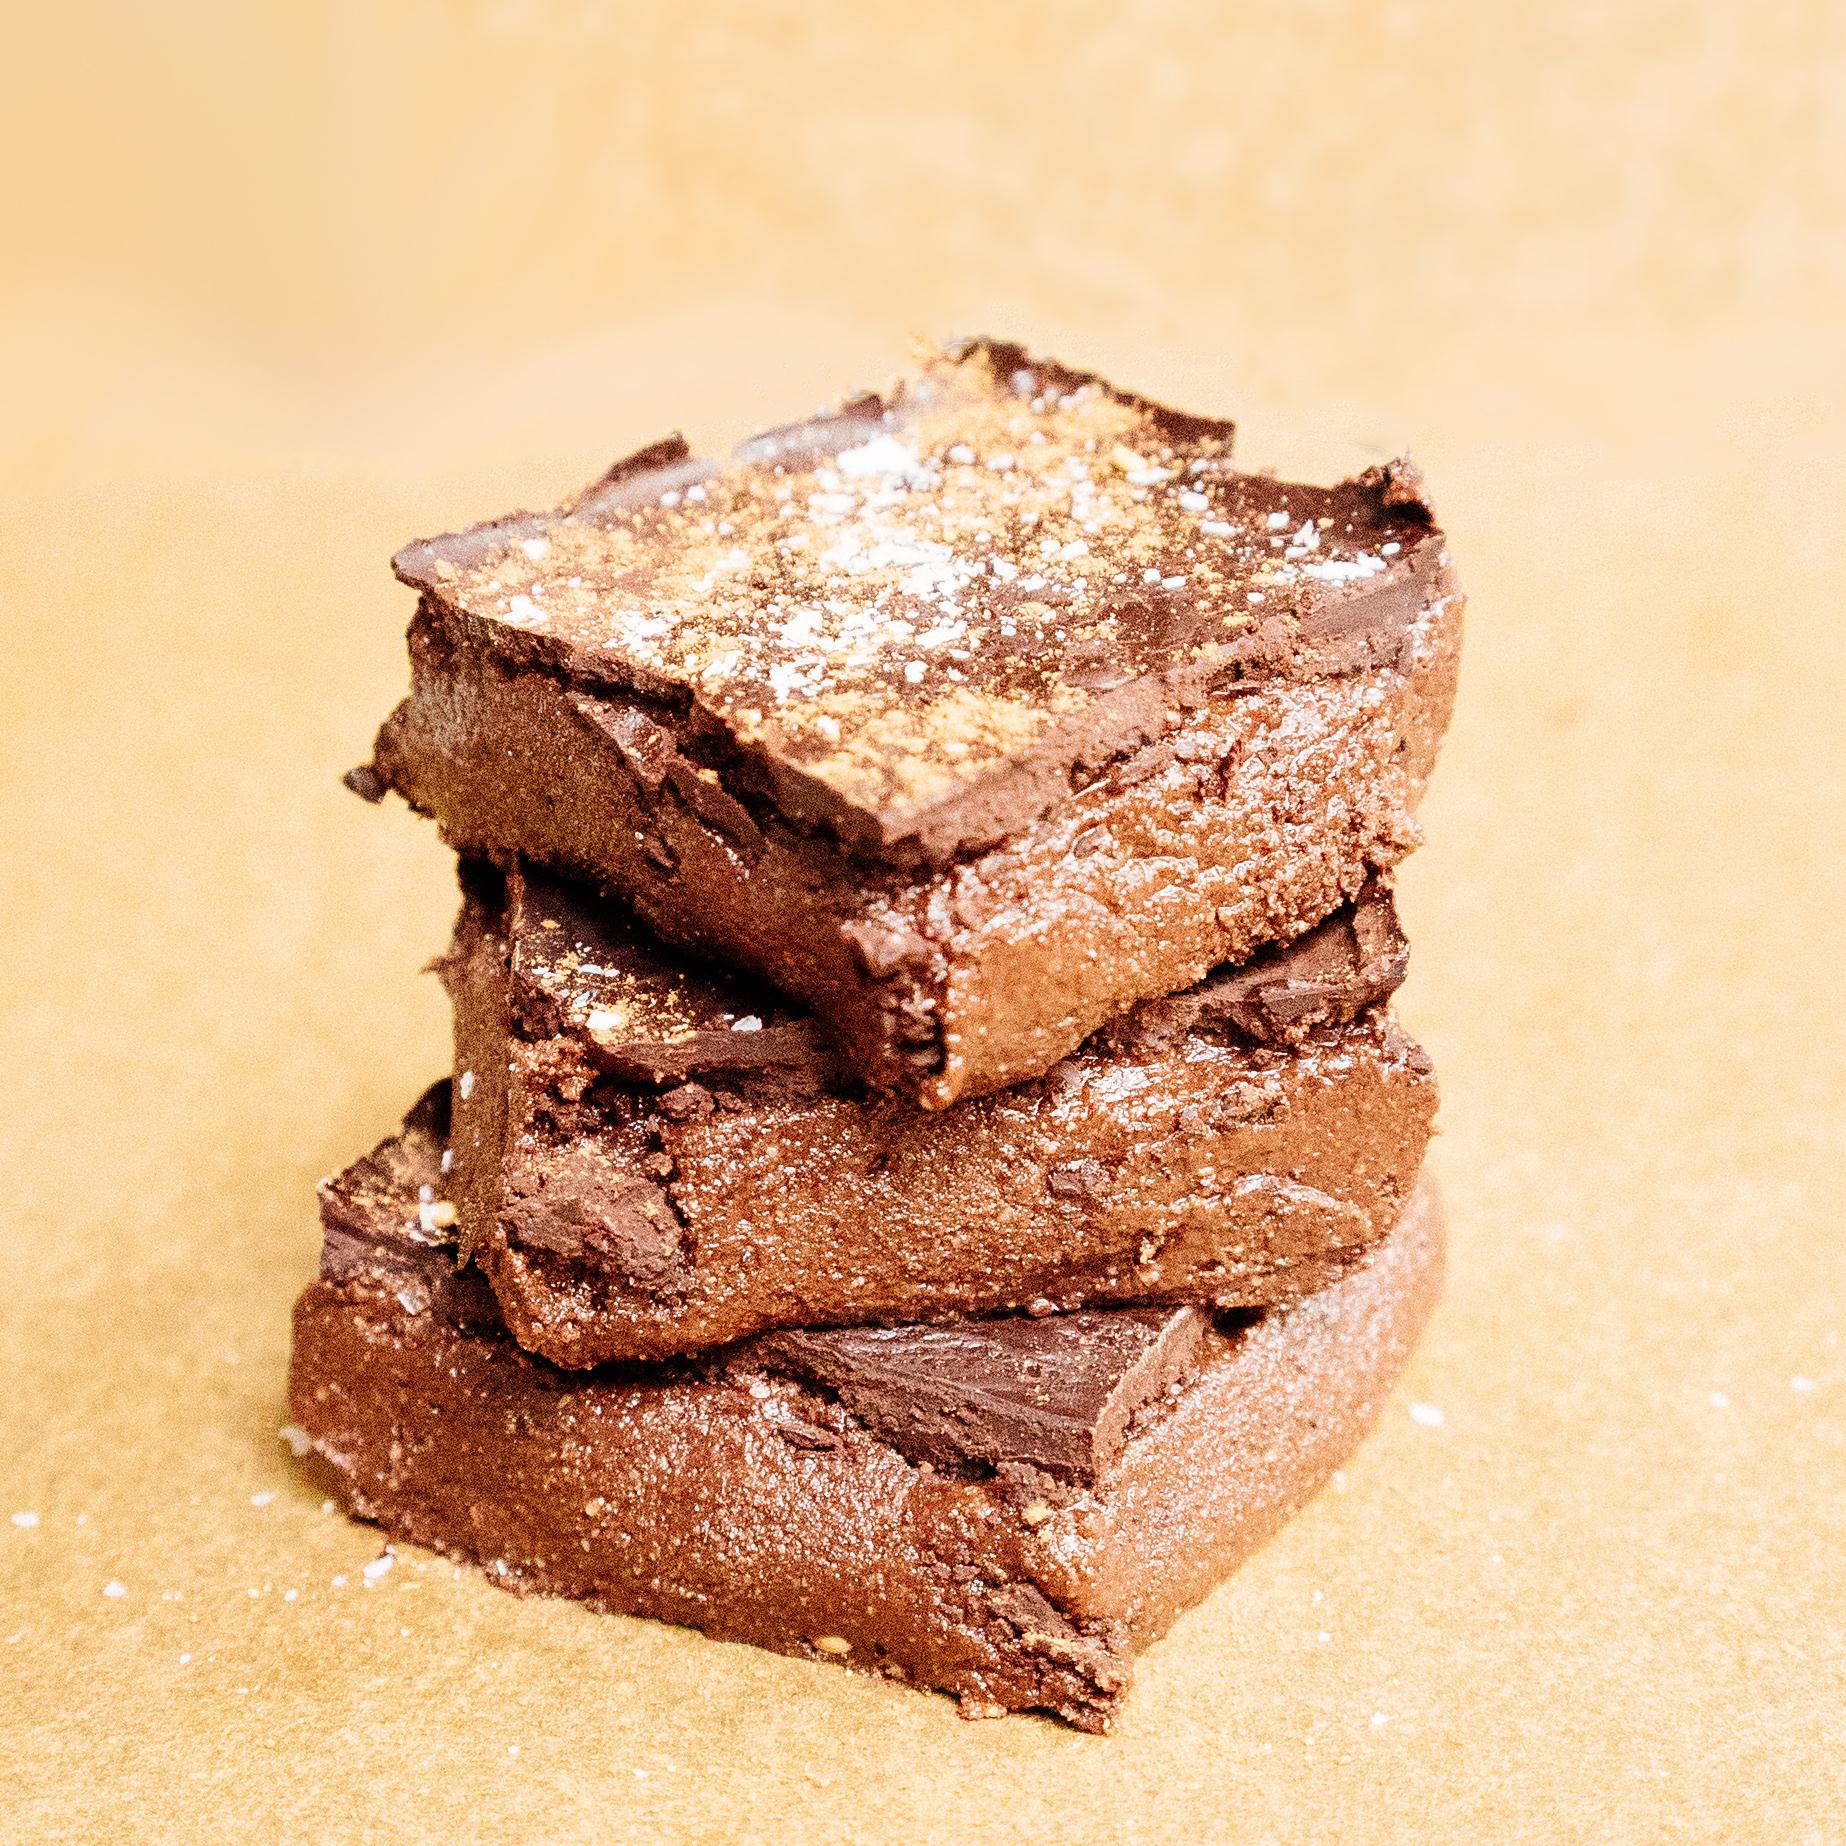 raw keto hemp seed brownies - gluten free, vegan, keto